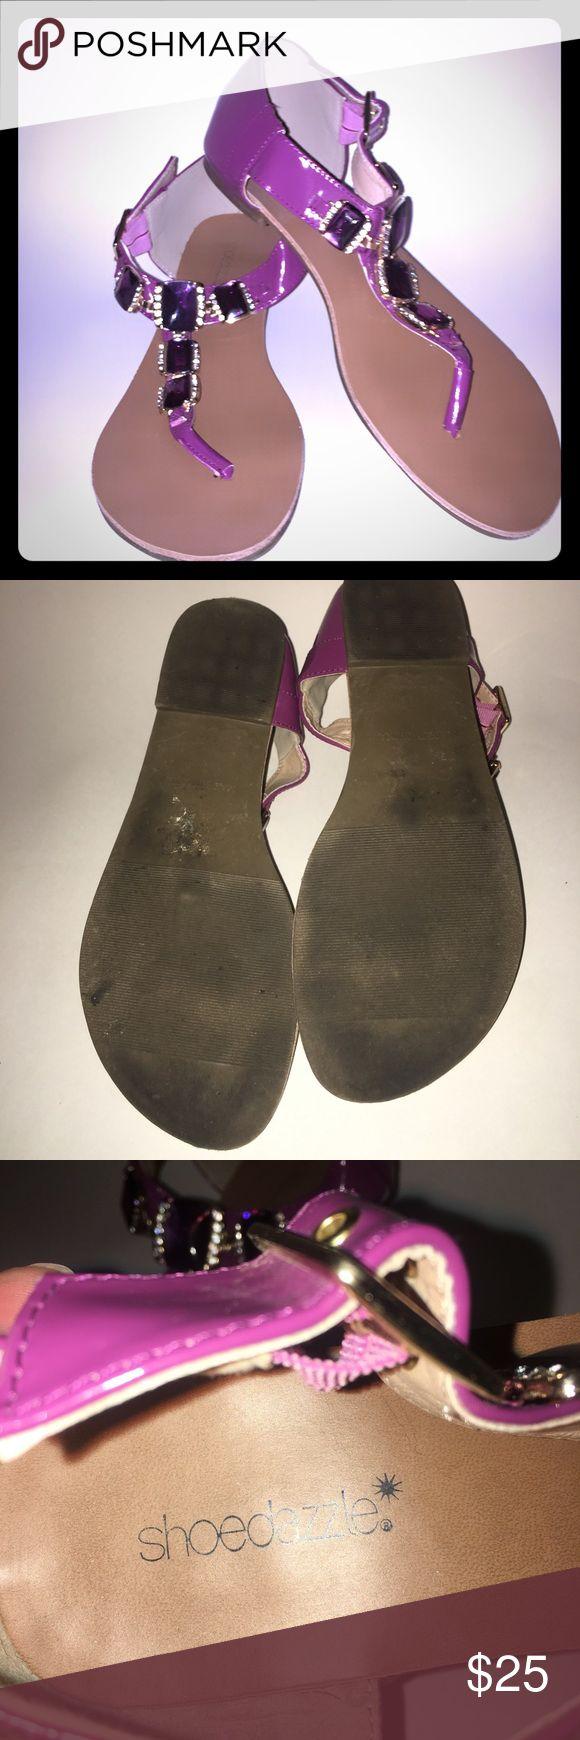 Shoedazzle sandals  like new Shoedazzle sandals  purple with purple gems worn one time like new size 8.5 shoedazzle Shoes Sandals